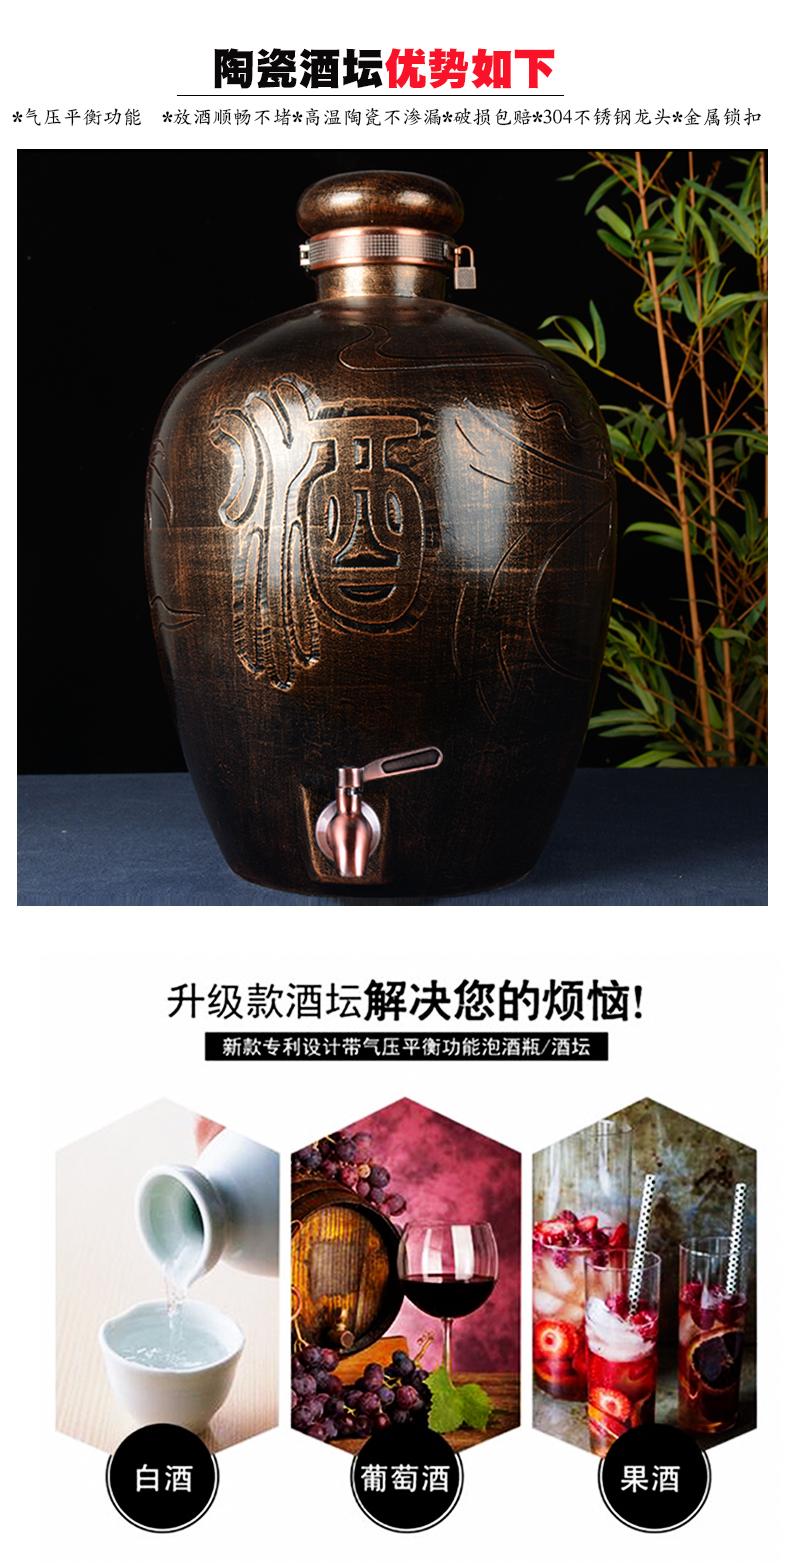 Jingdezhen ceramic porcelain bottle home wine pot seal wine bottle is empty wine jar ceramic 20 jins 30 jins 50 pounds